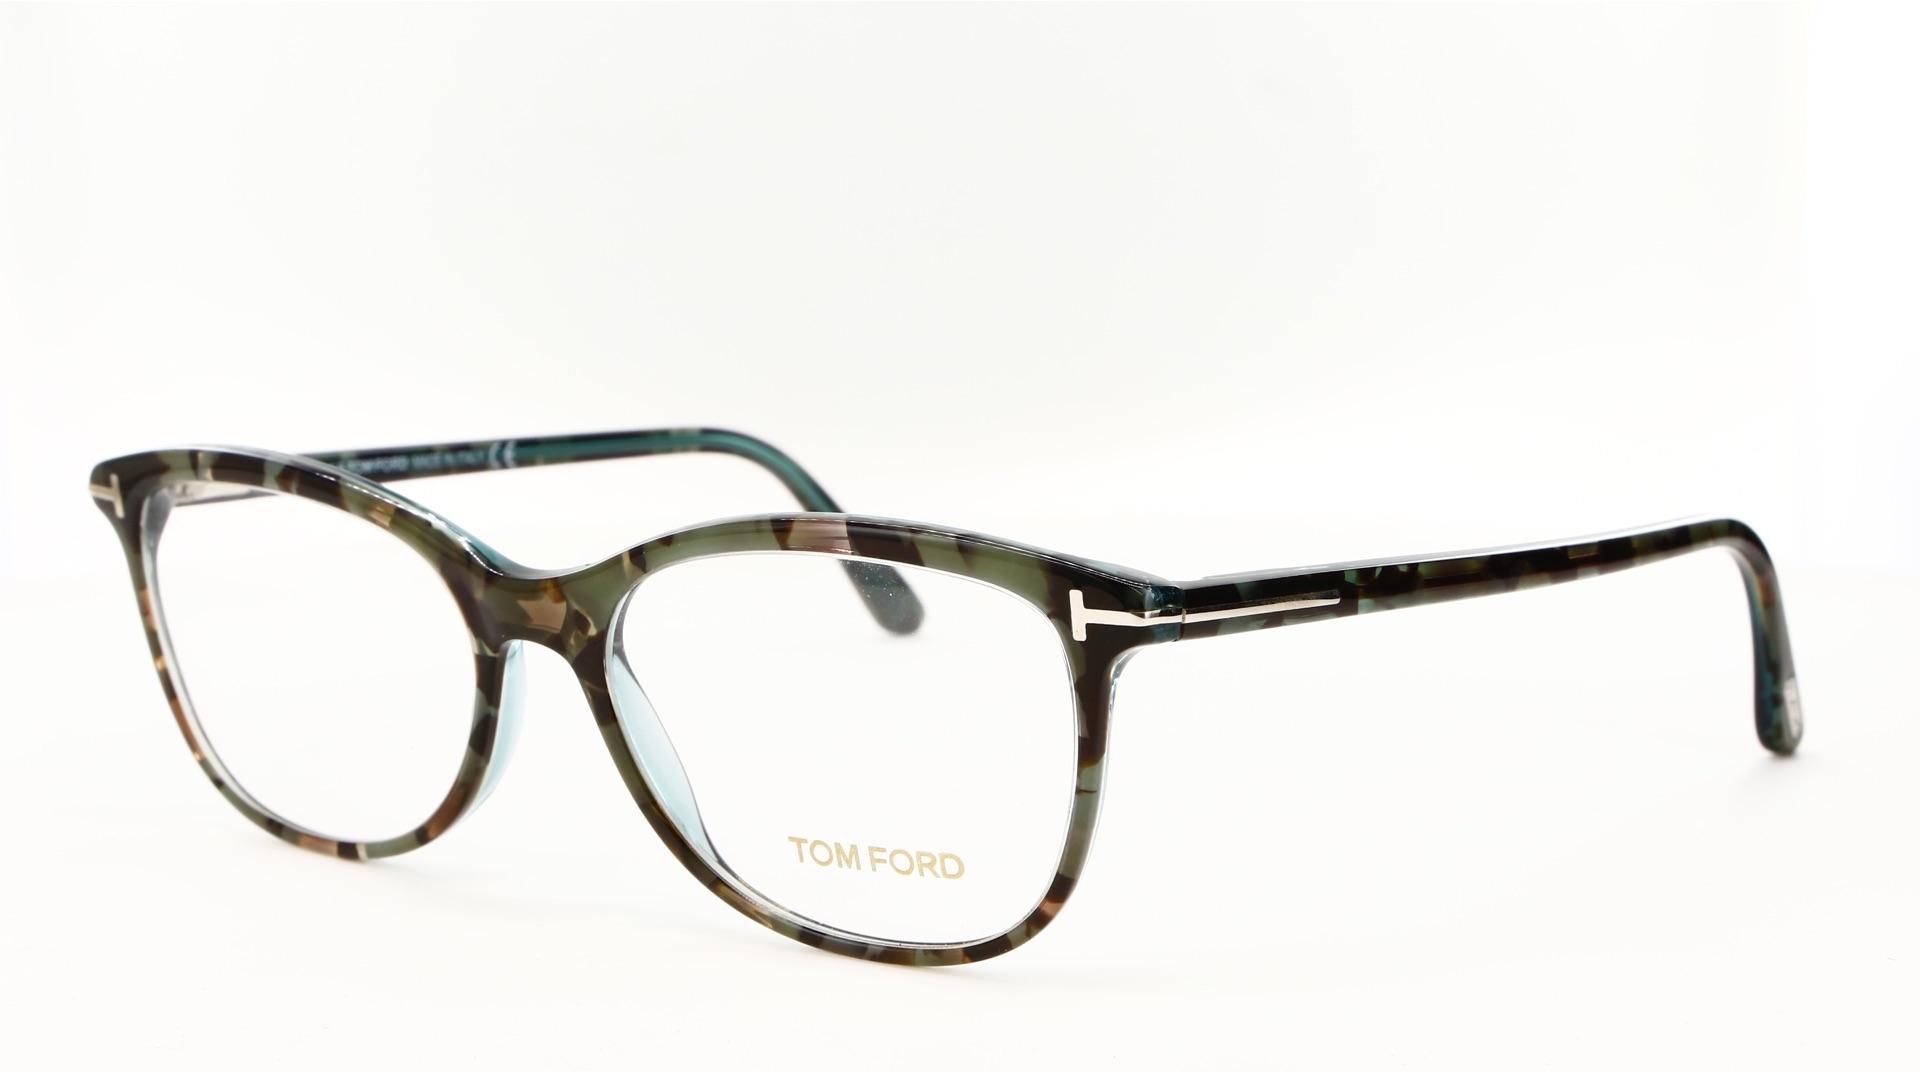 Tom Ford - ref: 75313